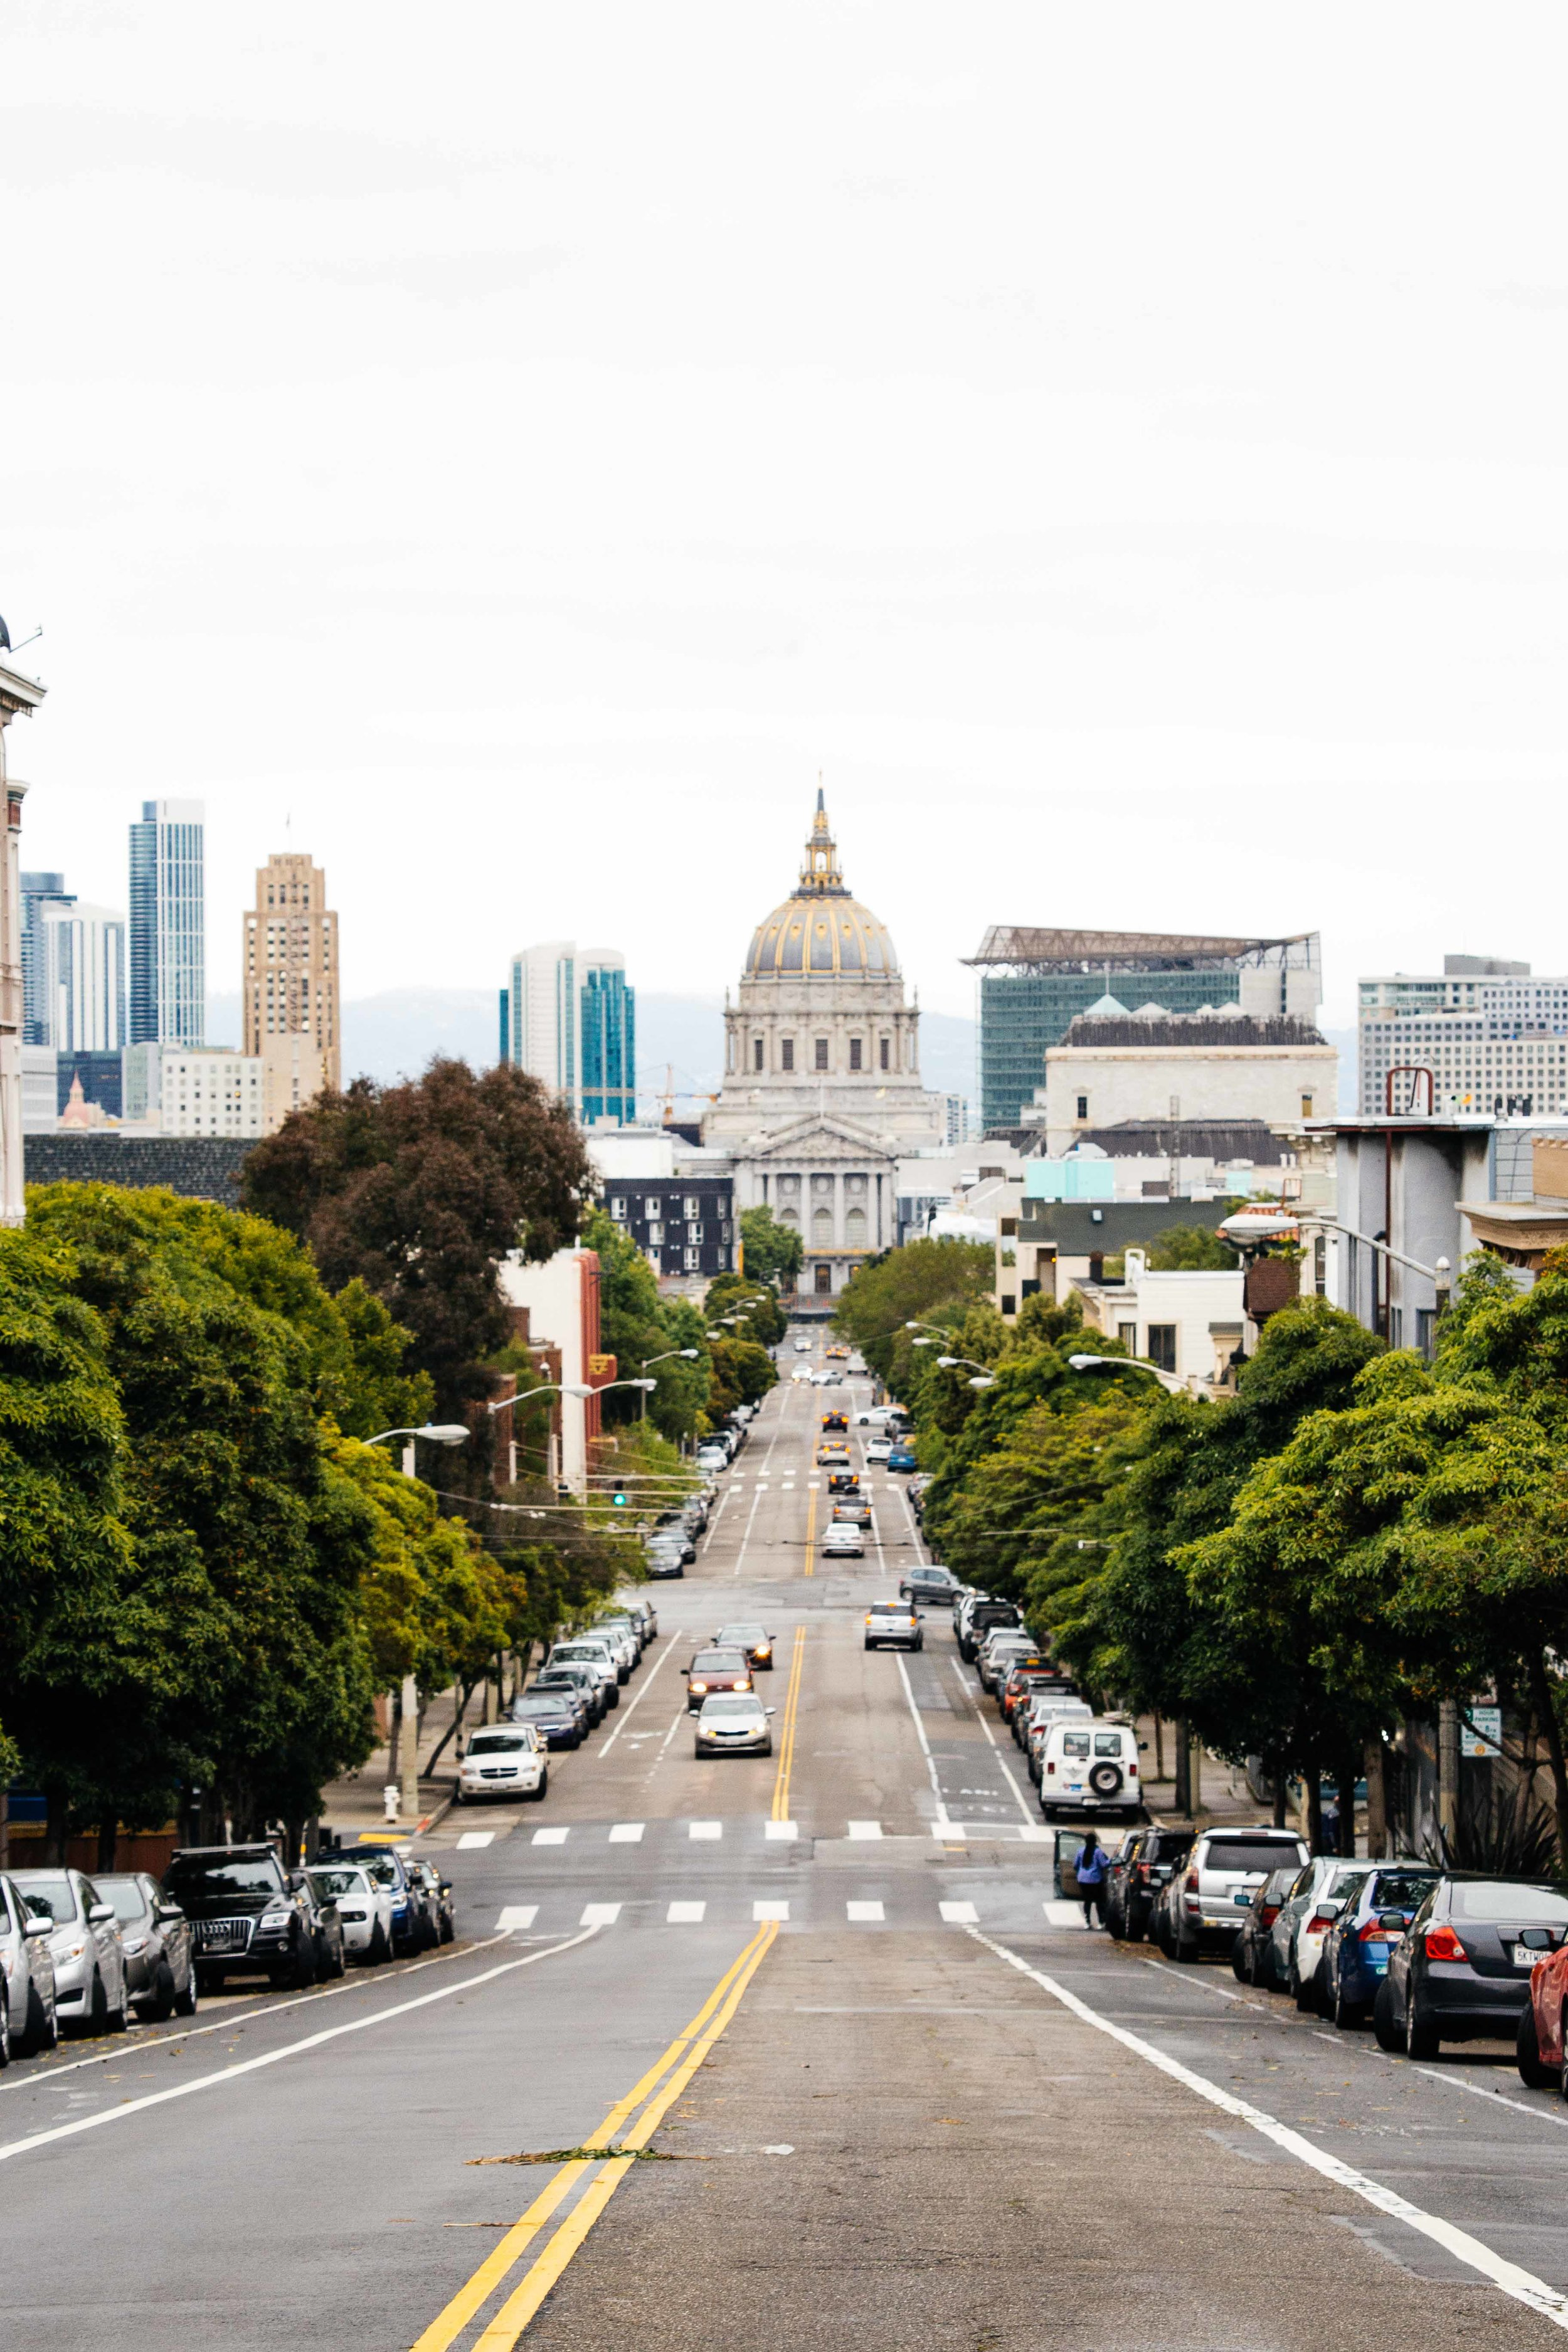 One of San Francisco's streets. Photo: Marine Raynard